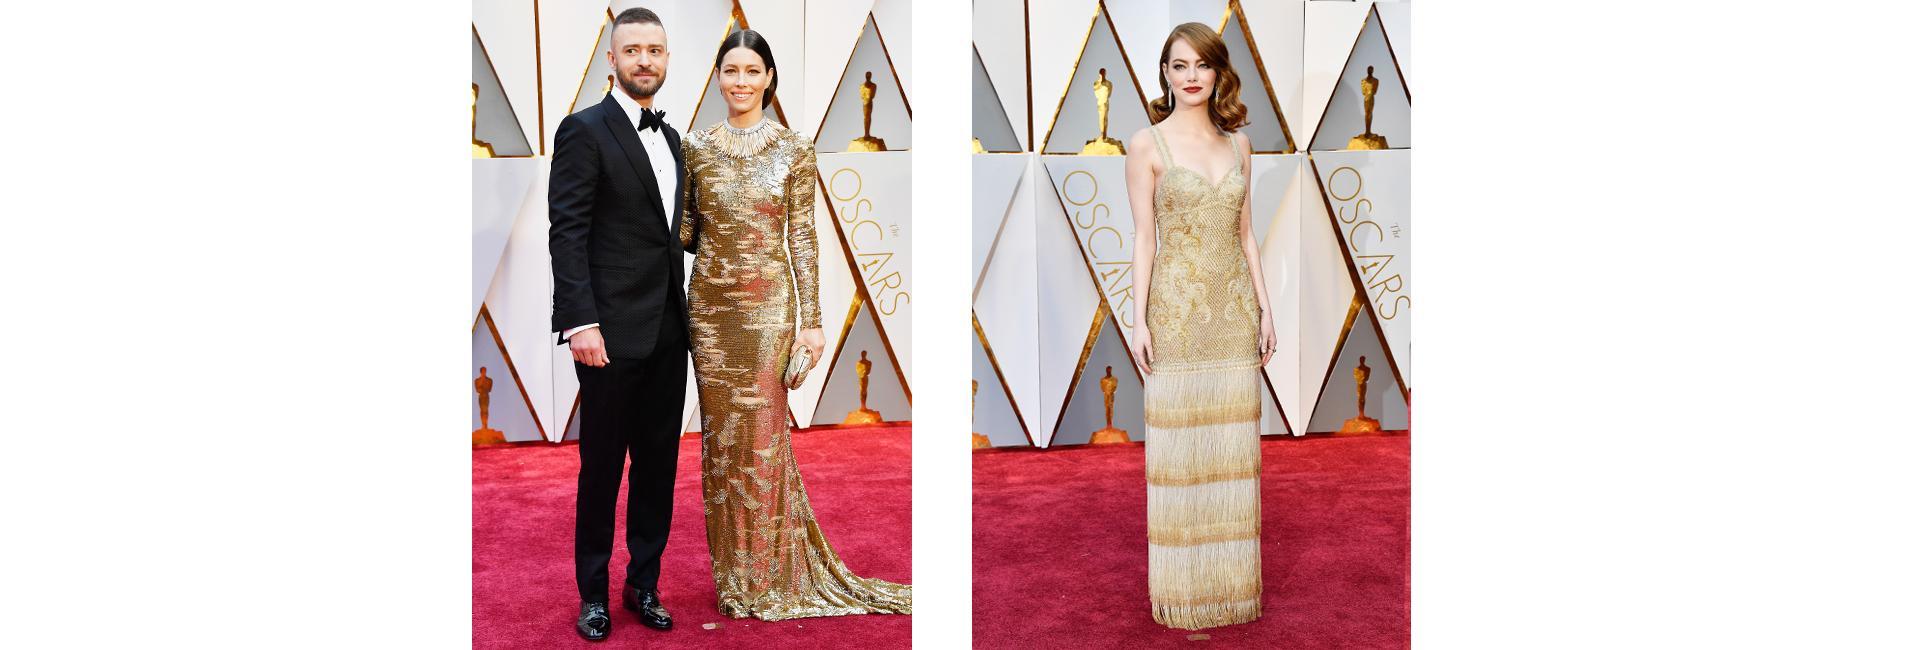 Джастин Тимберлейк и Джессика Бил в Kaufman Franco, Эмма Стоун в Givenchy Couture